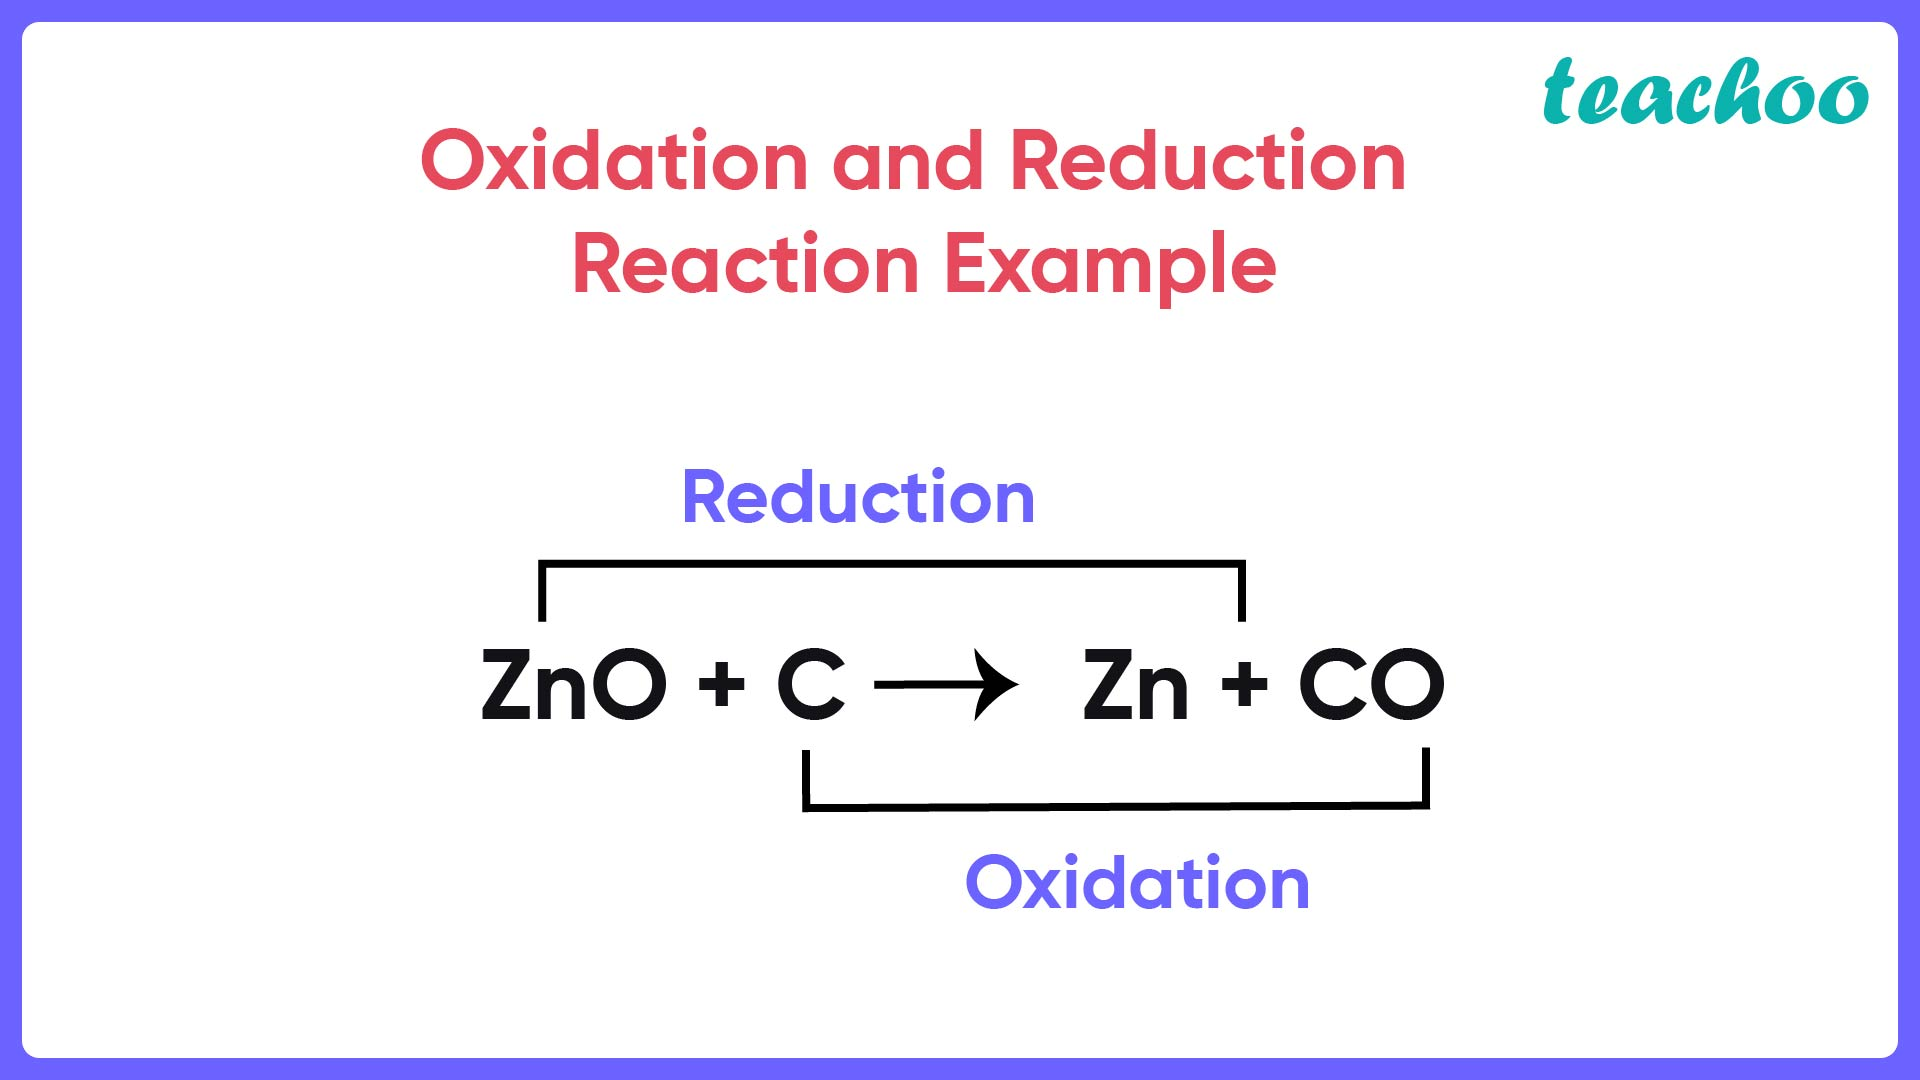 Oxidation and Reduction Reaction Example - Teachoo-01.jpg